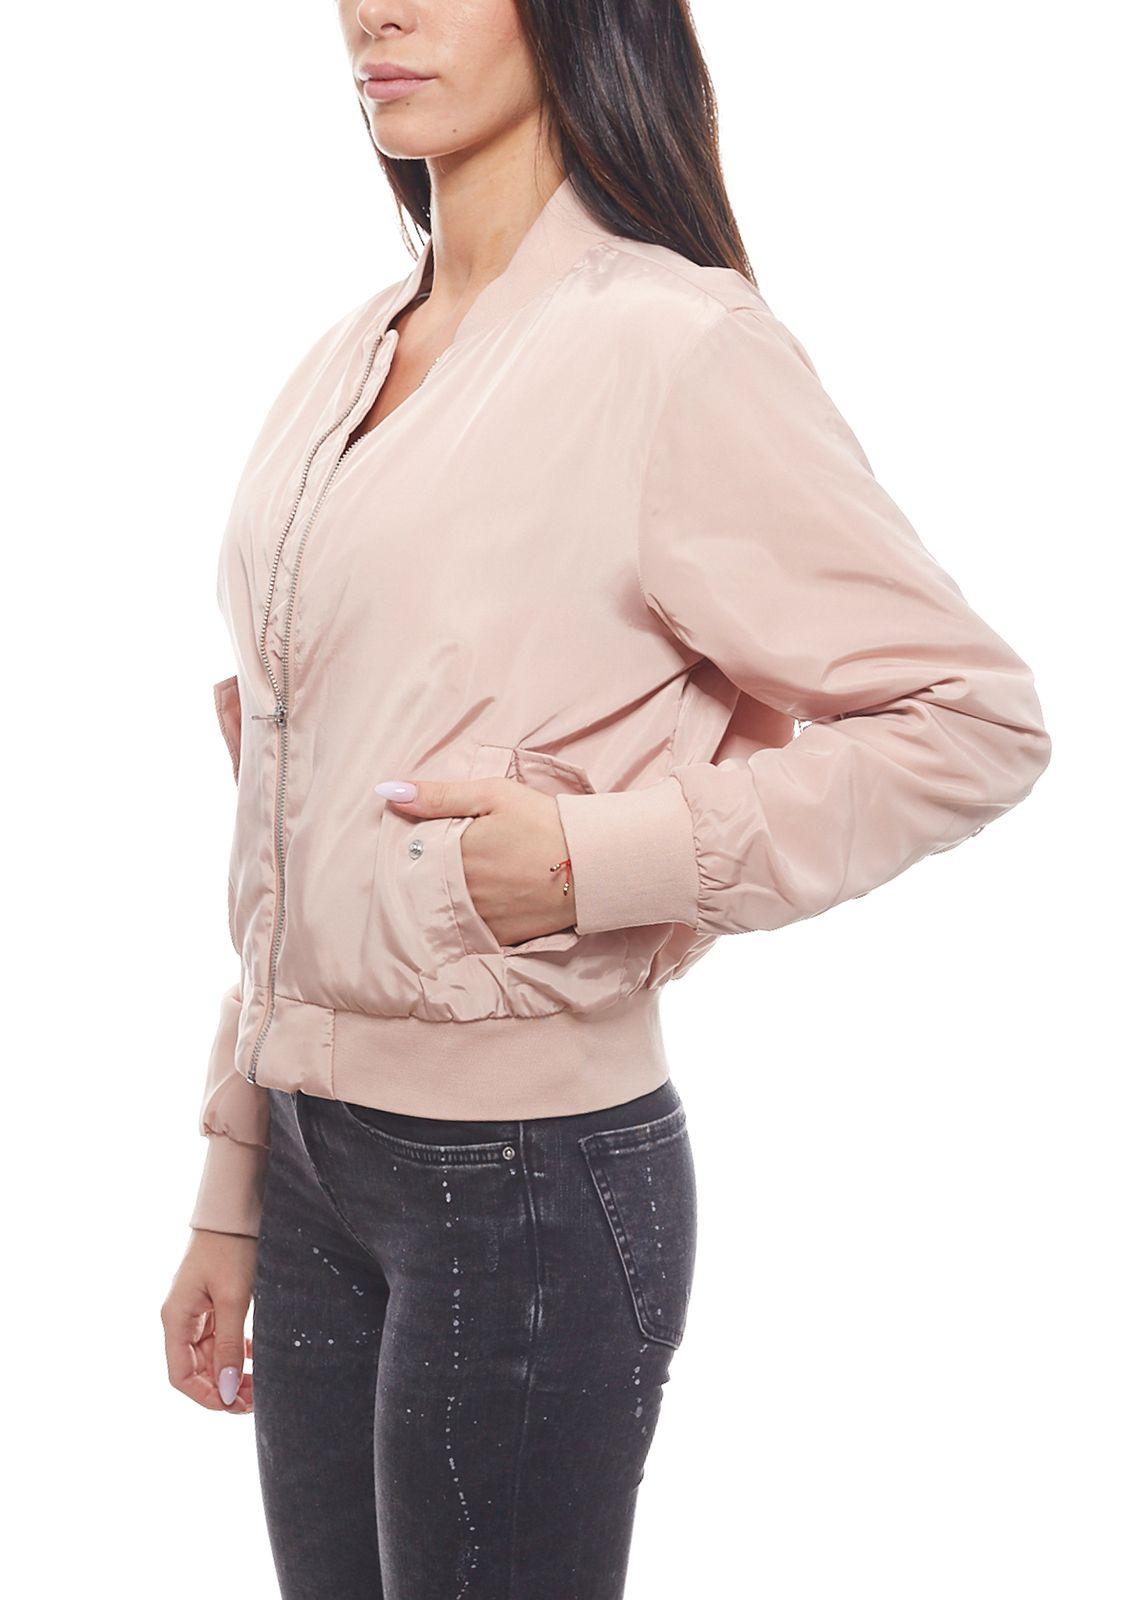 01b4f1025d751 melrose Damen-Bekleidung im Online-Shop & Outlet46.de